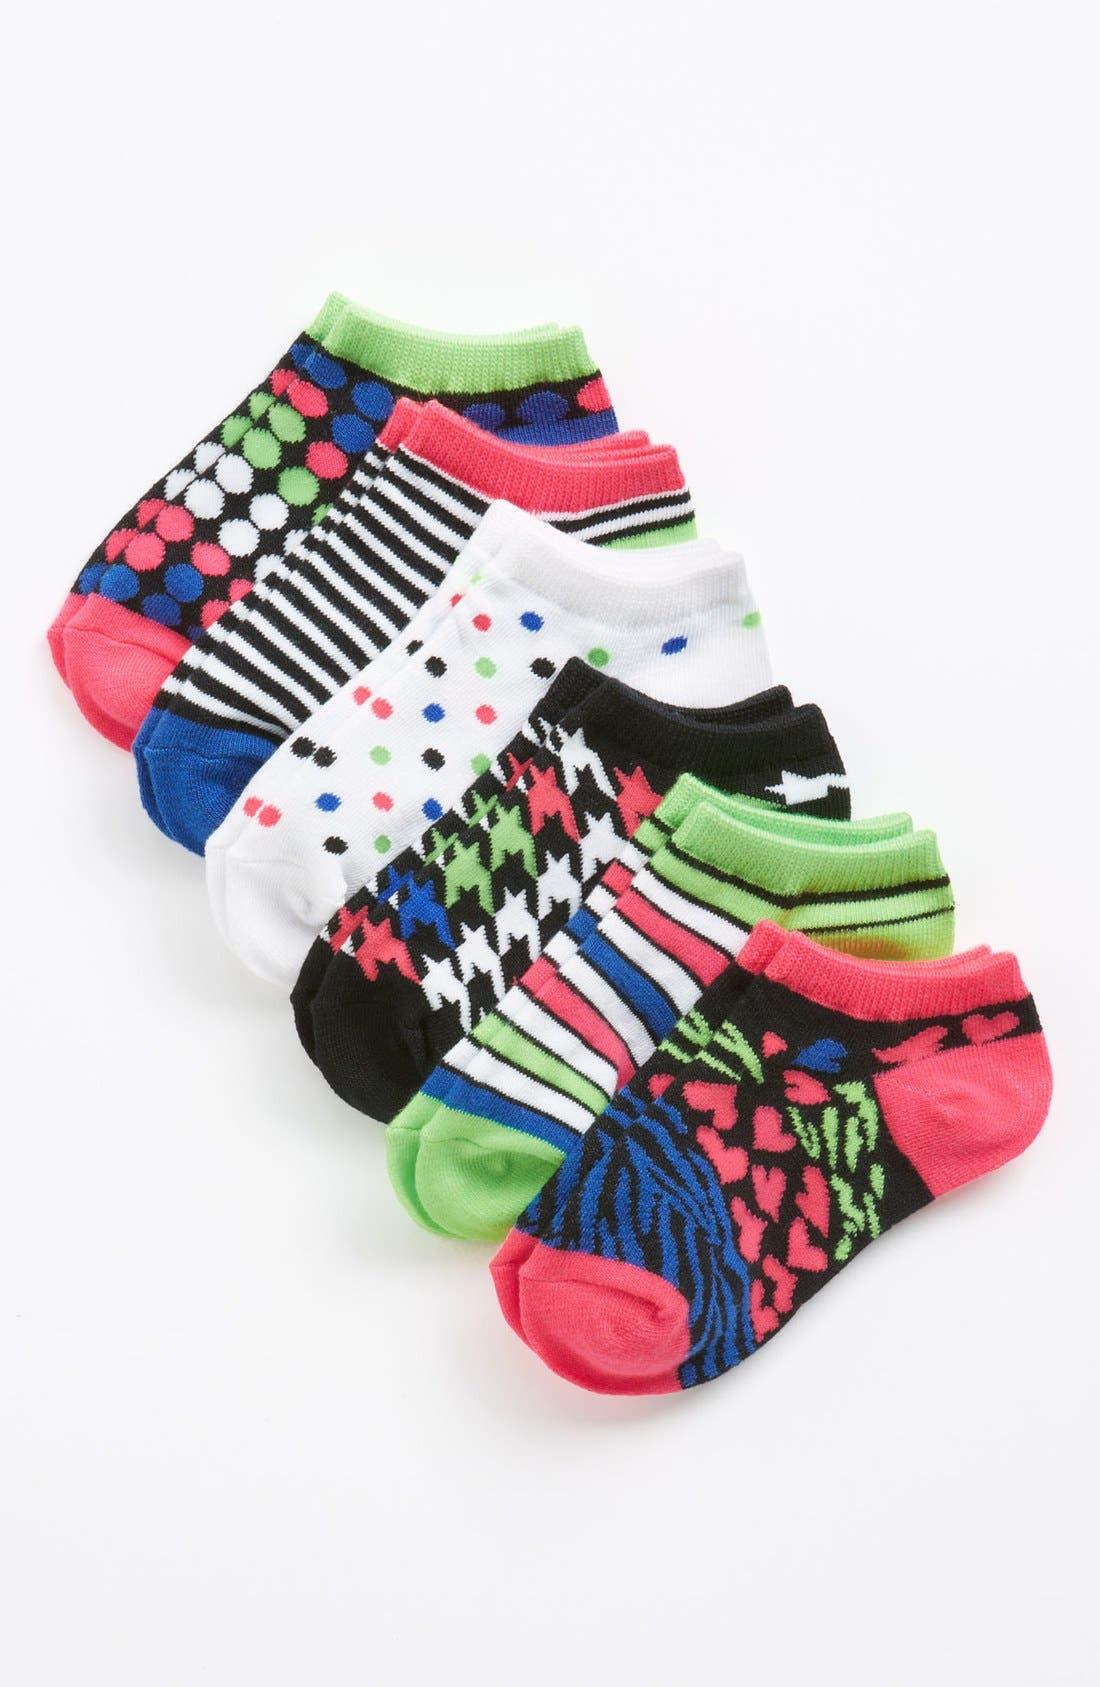 Alternate Image 1 Selected - Nordstrom 'Mod Mix' Low Cut Socks (6-Pack) (Toddler, Little Girls & Big Girls)